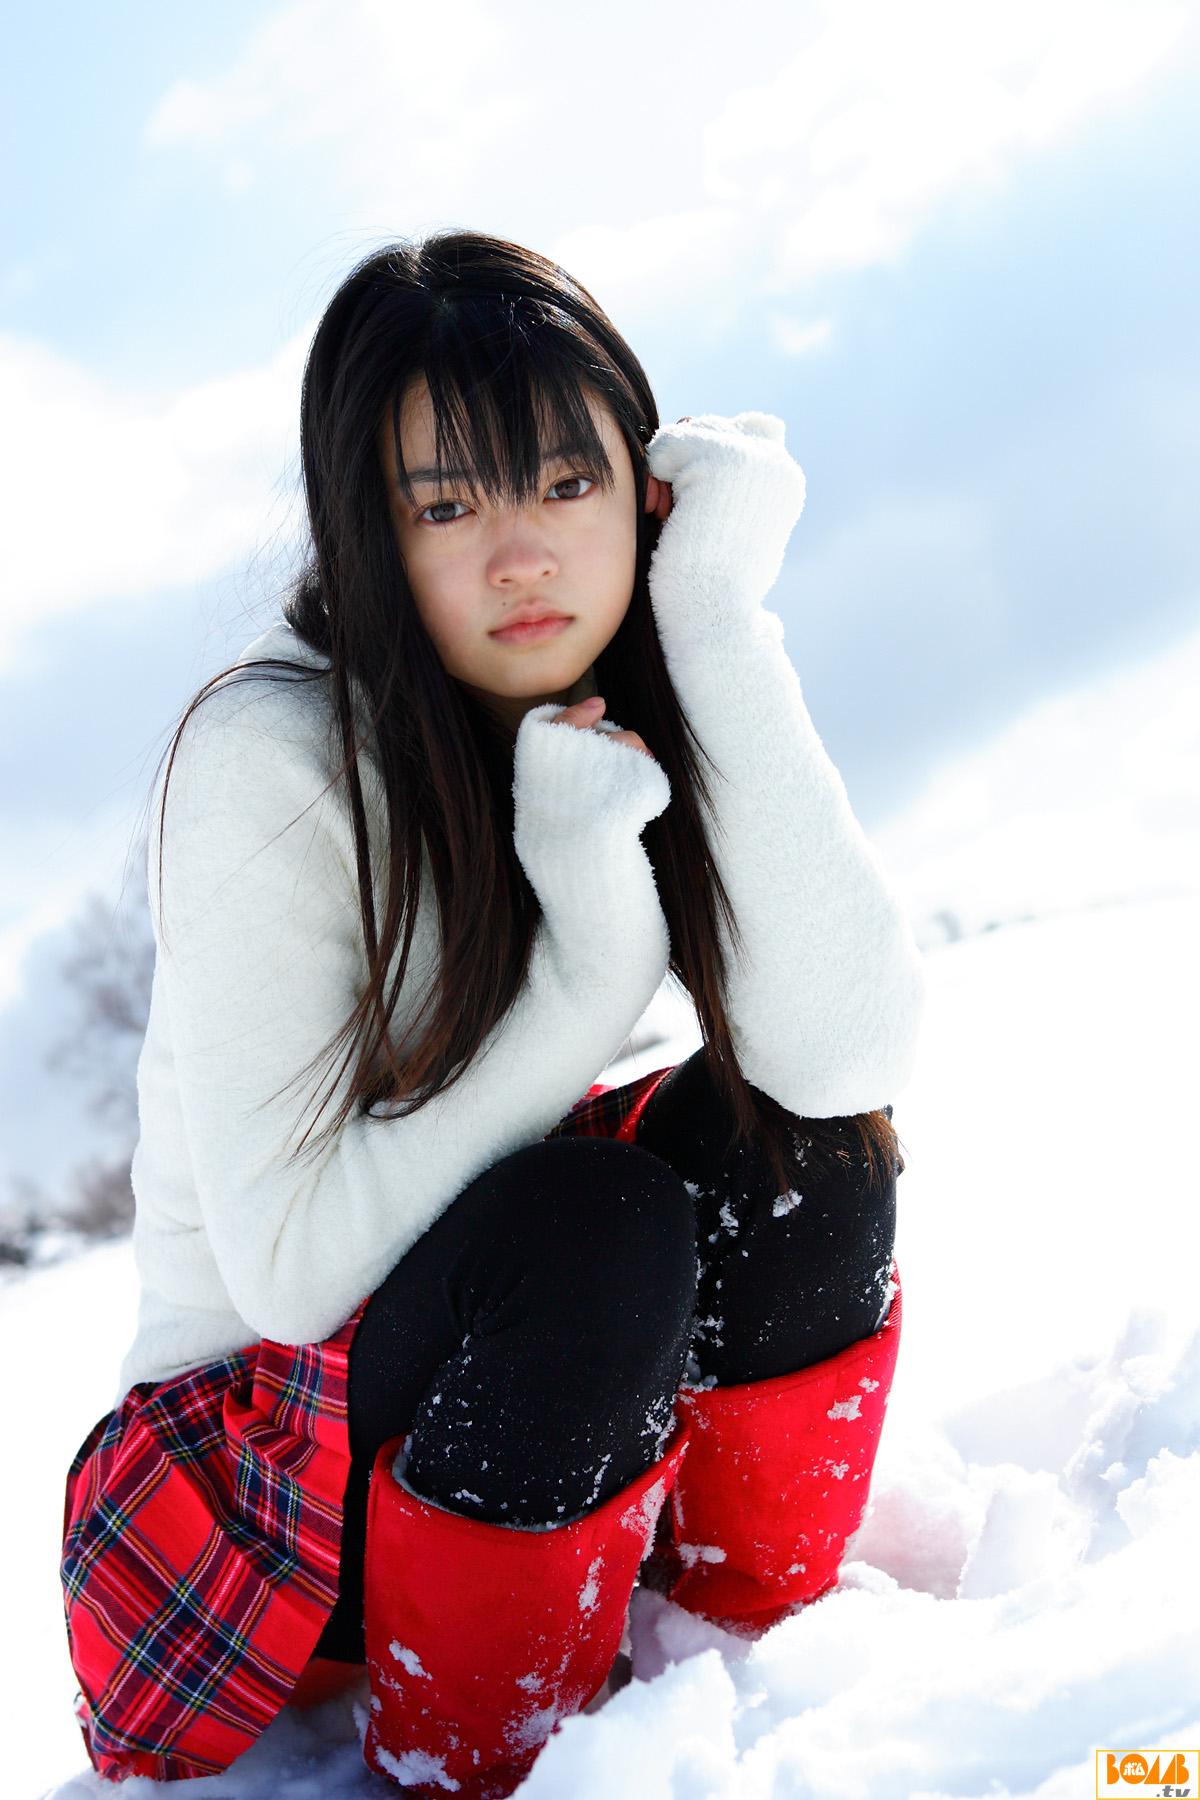 xrk009-jpg [FSo] Ryoko Kobayashi - Bomb.tv Channel B 小林涼子 [2007.05][20.57 MB]